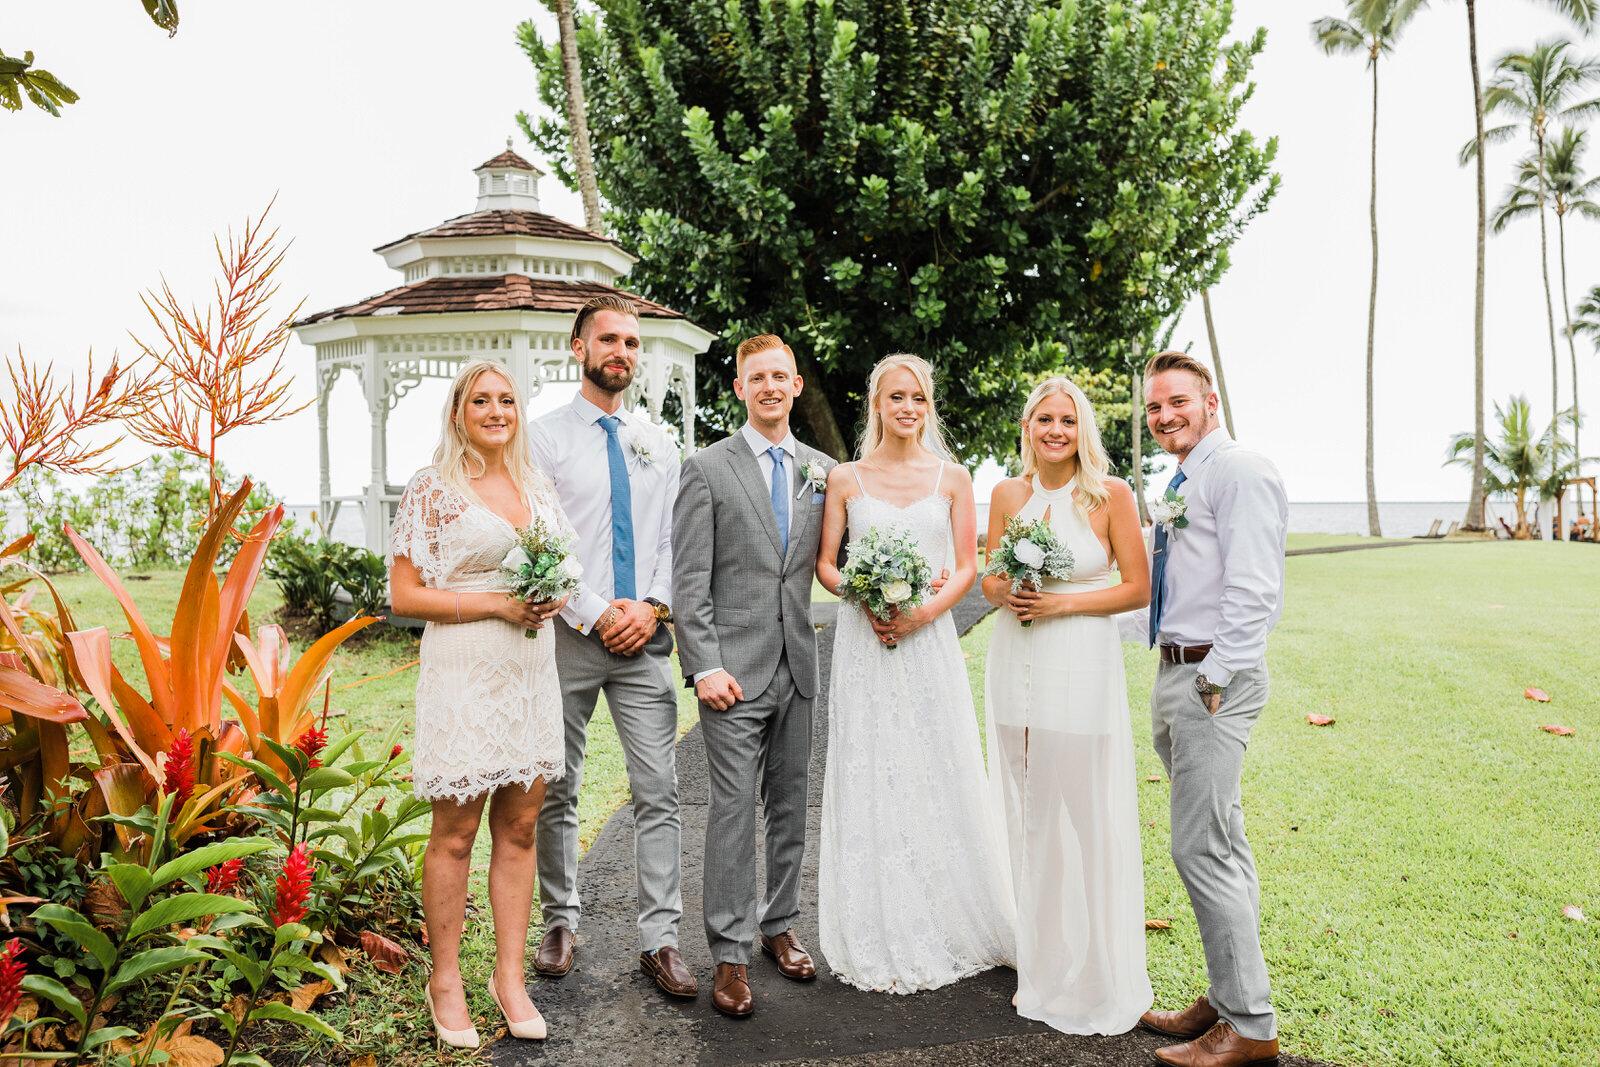 small-wedding-hawaii-destination-hilton-coconut-island-9831-1.jpg